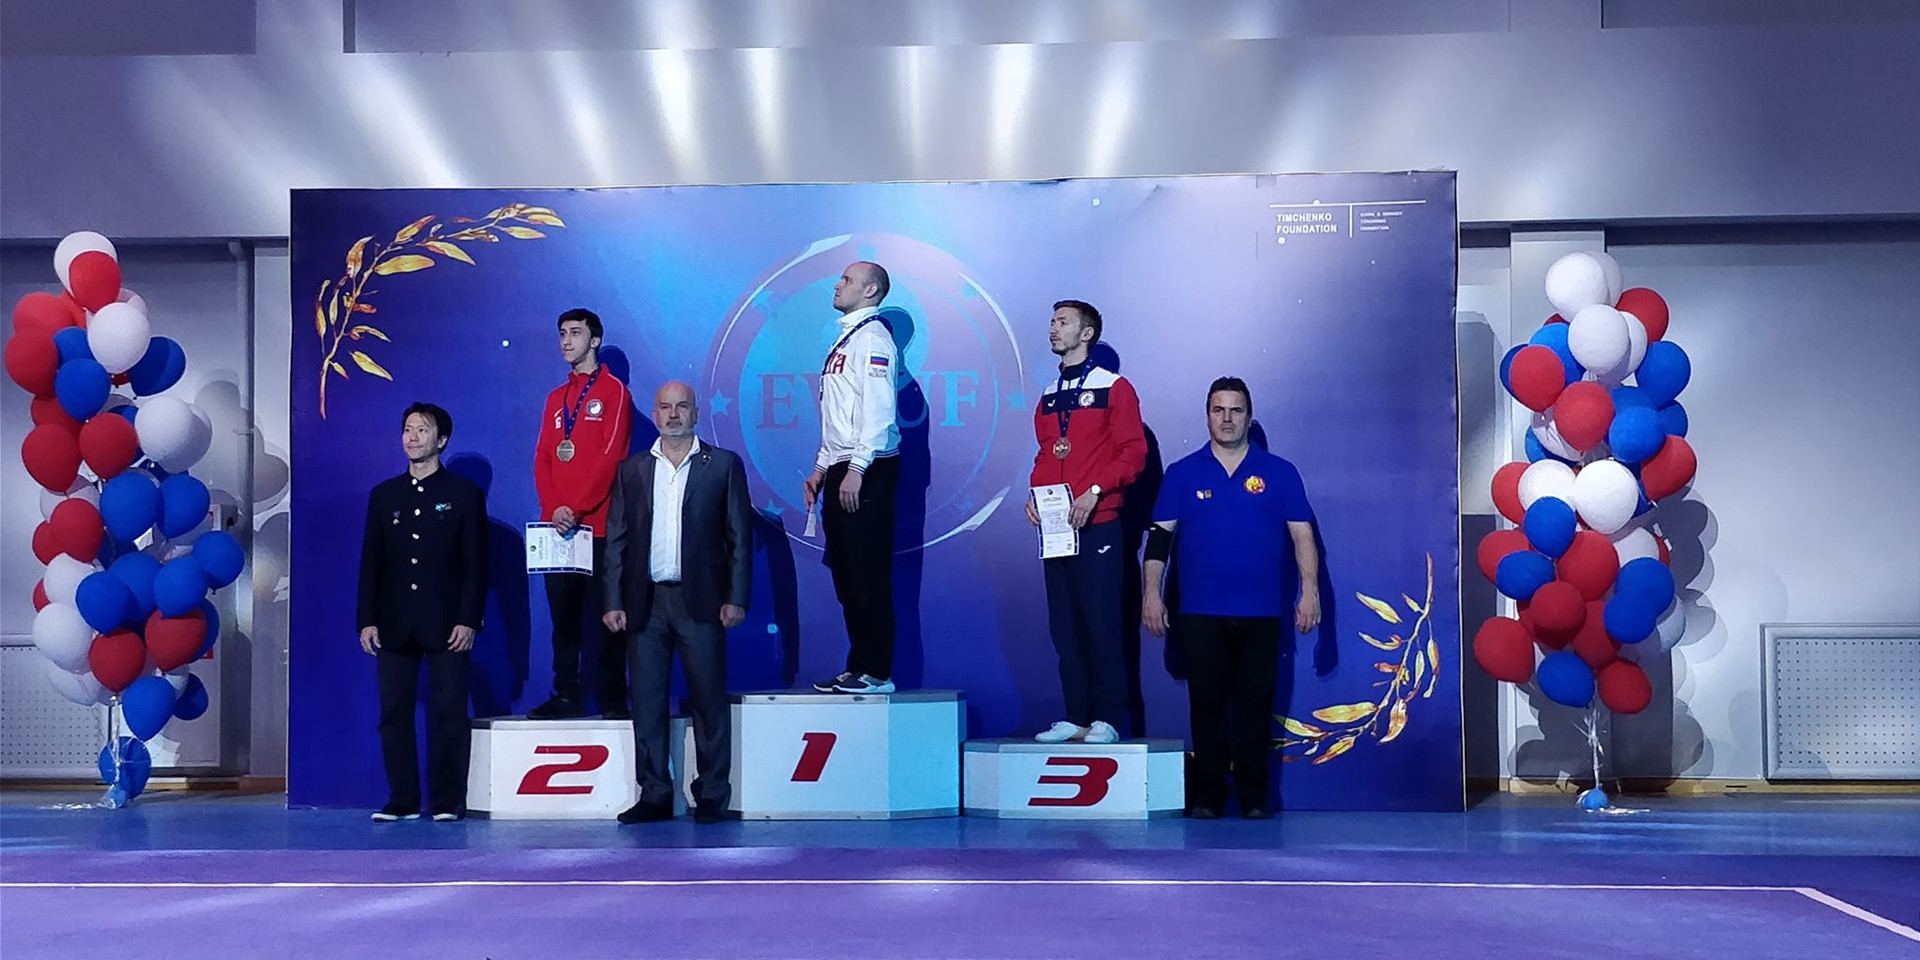 Silver medalist, Mujahid Guven